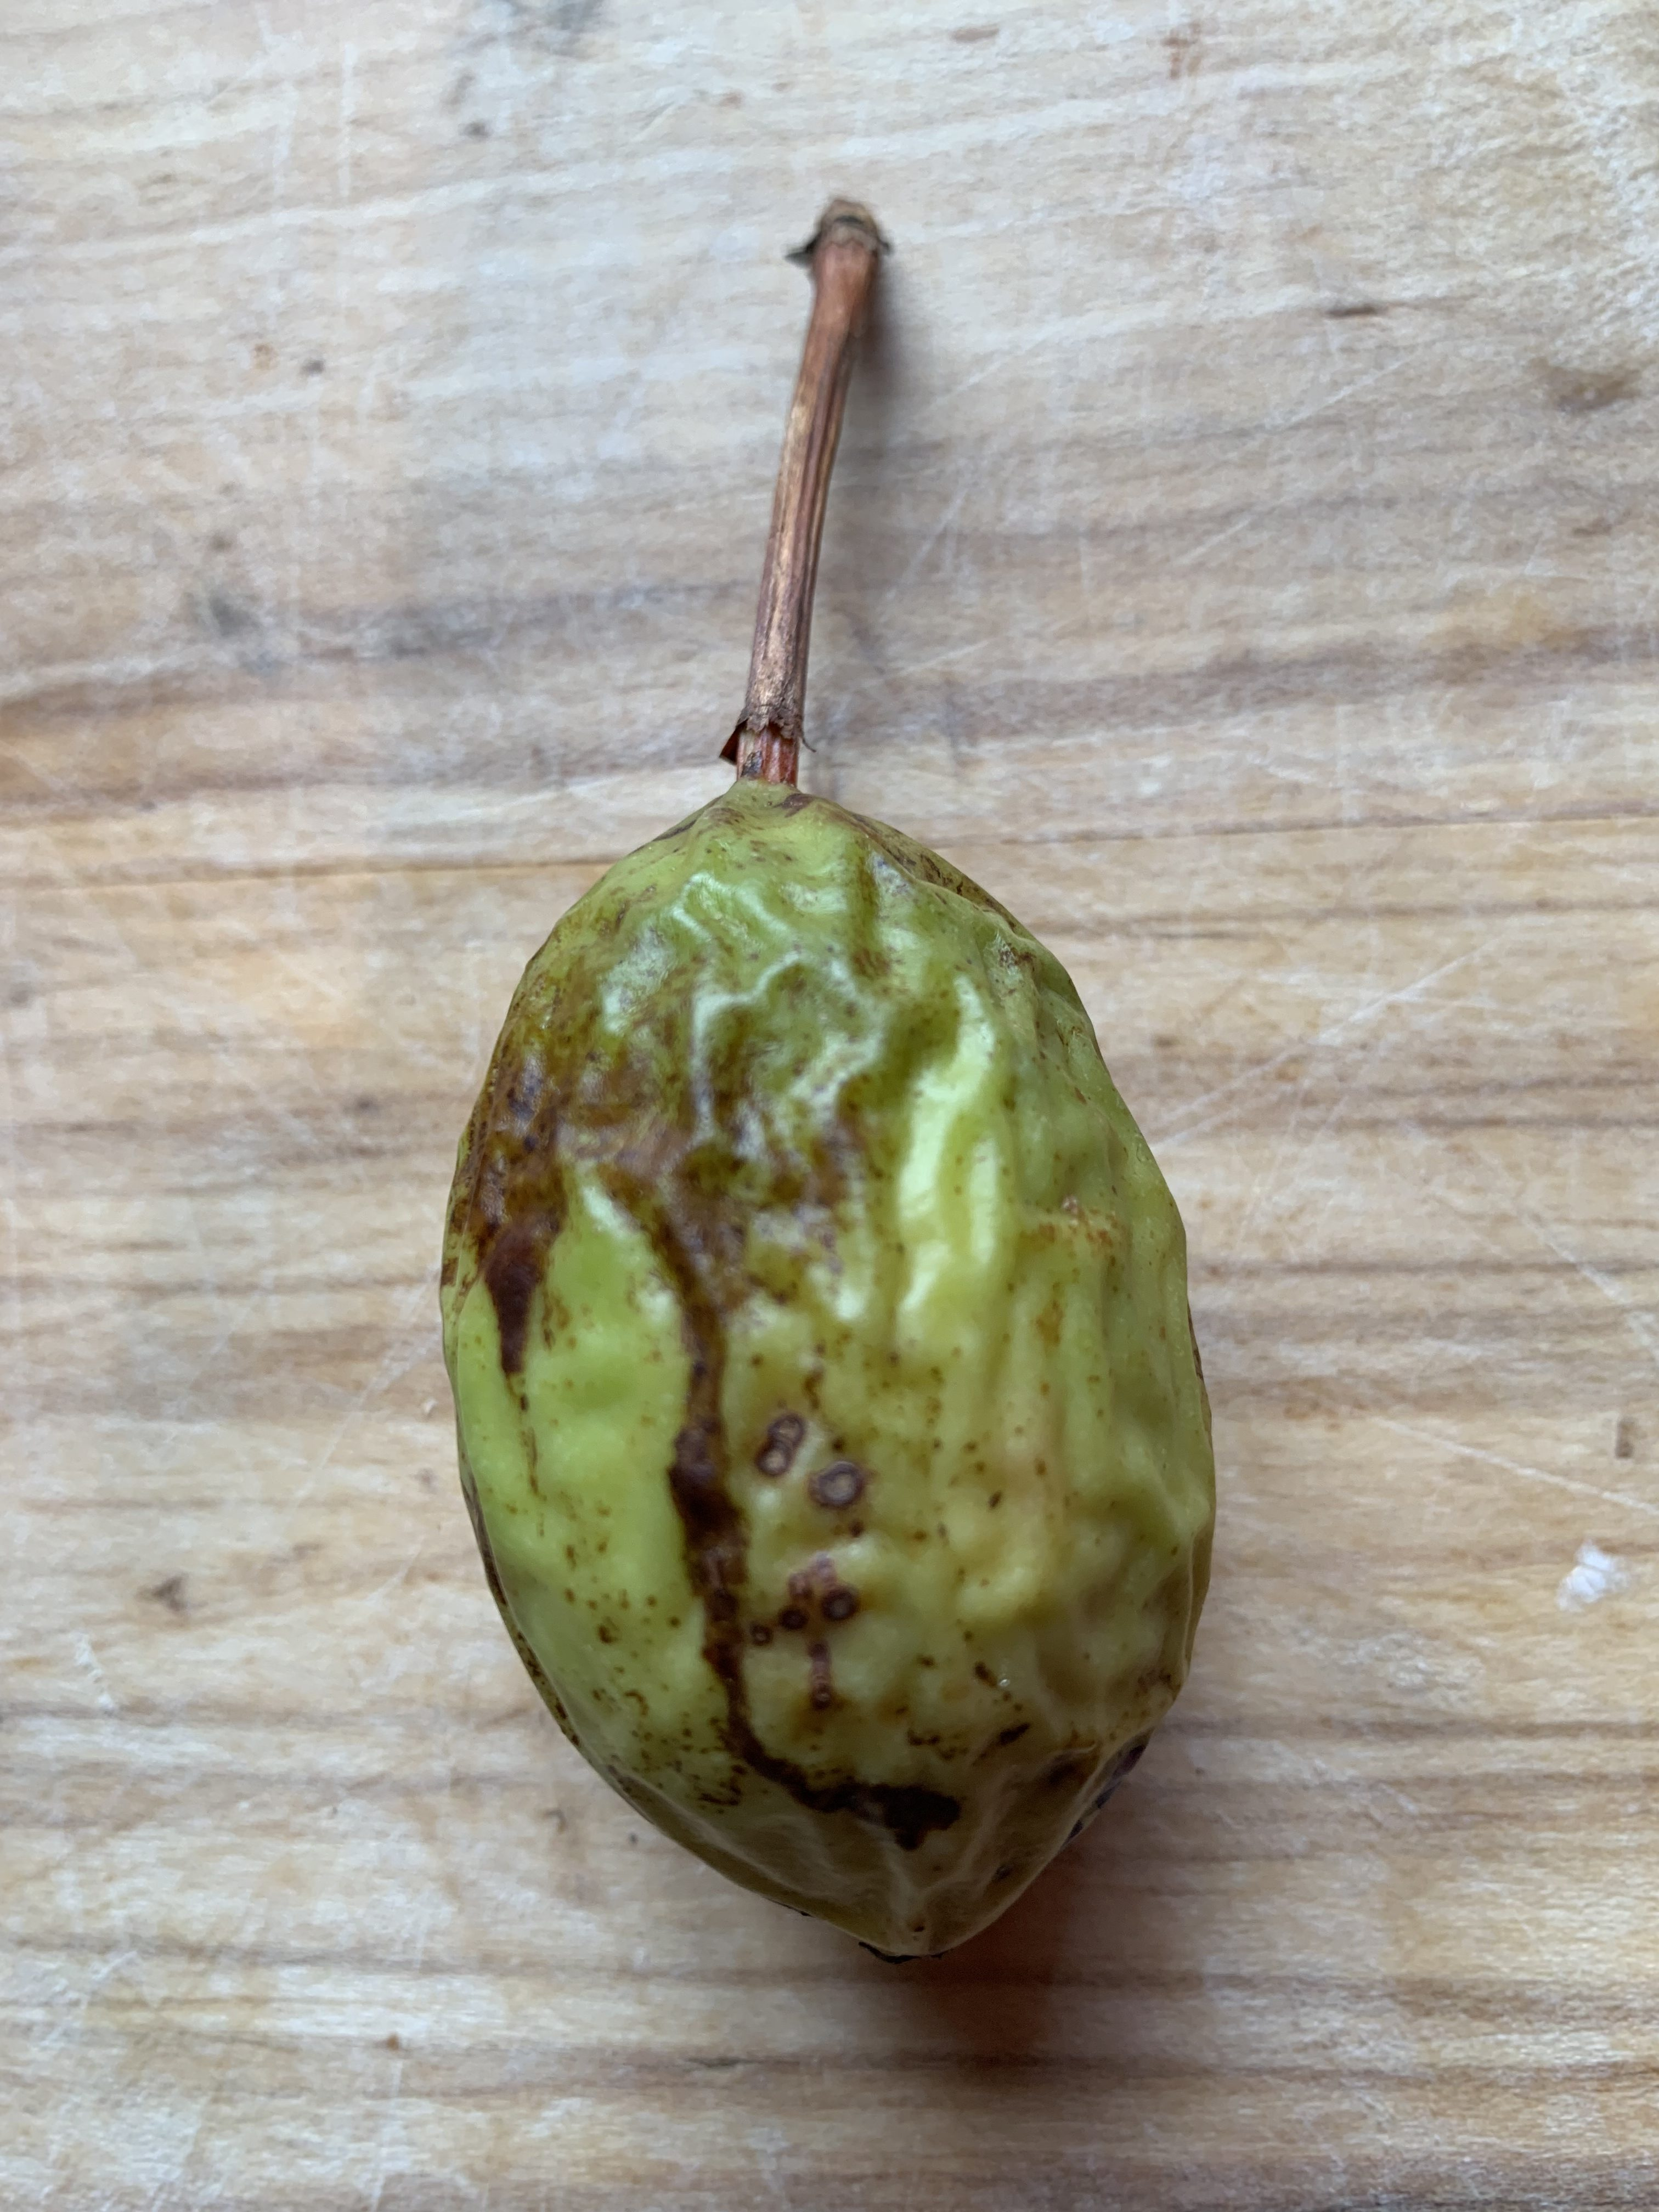 Passiflora manicata fruit